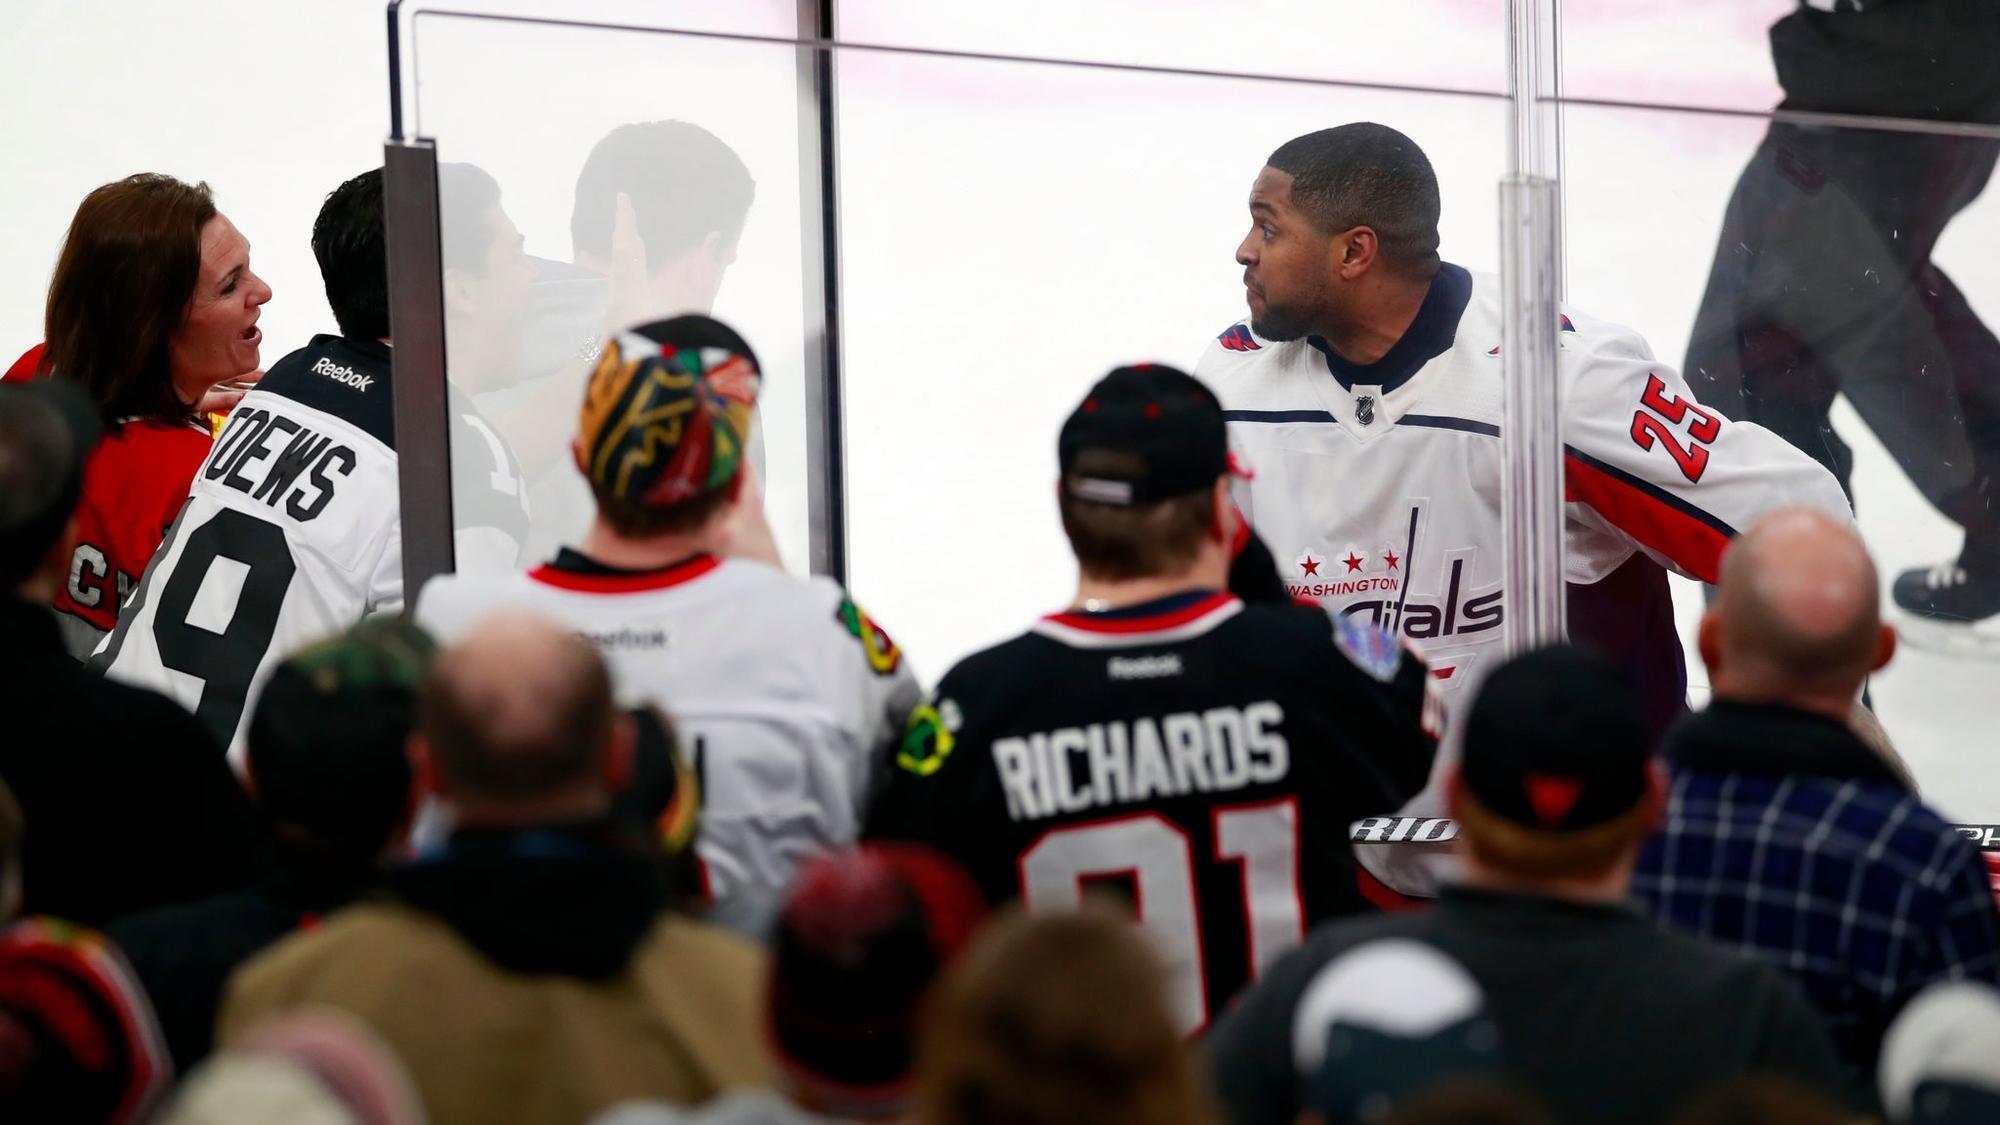 Ct-spt-blackhawks-smith-pelly-racism-donations-rosenbloom-20180221